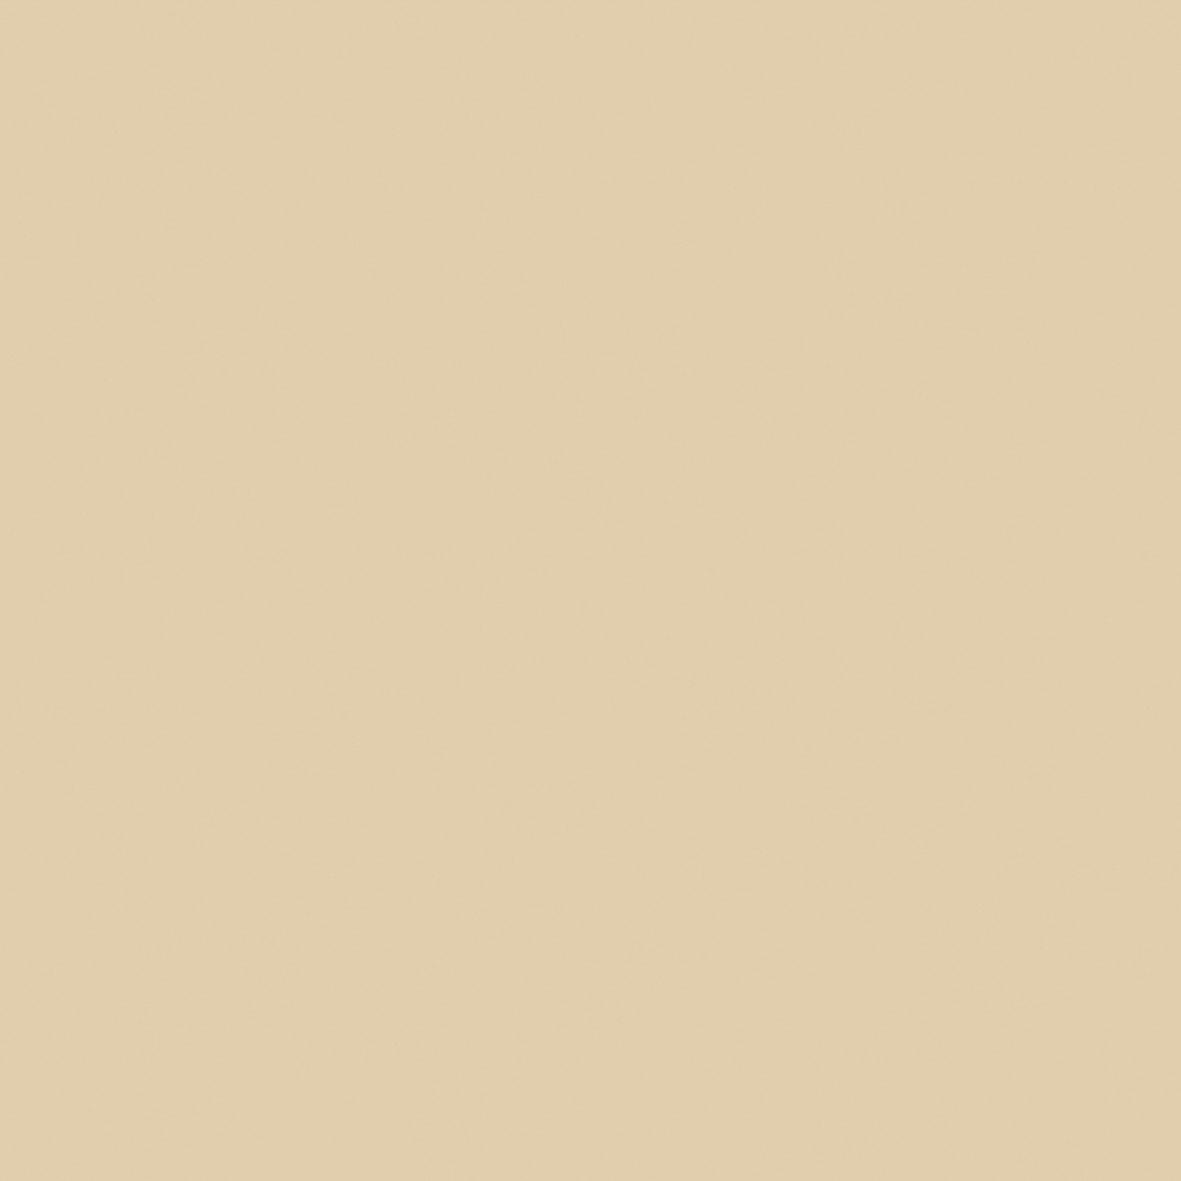 Roller_Swatch_Banlight_Duo_FR_Linen_RE03315